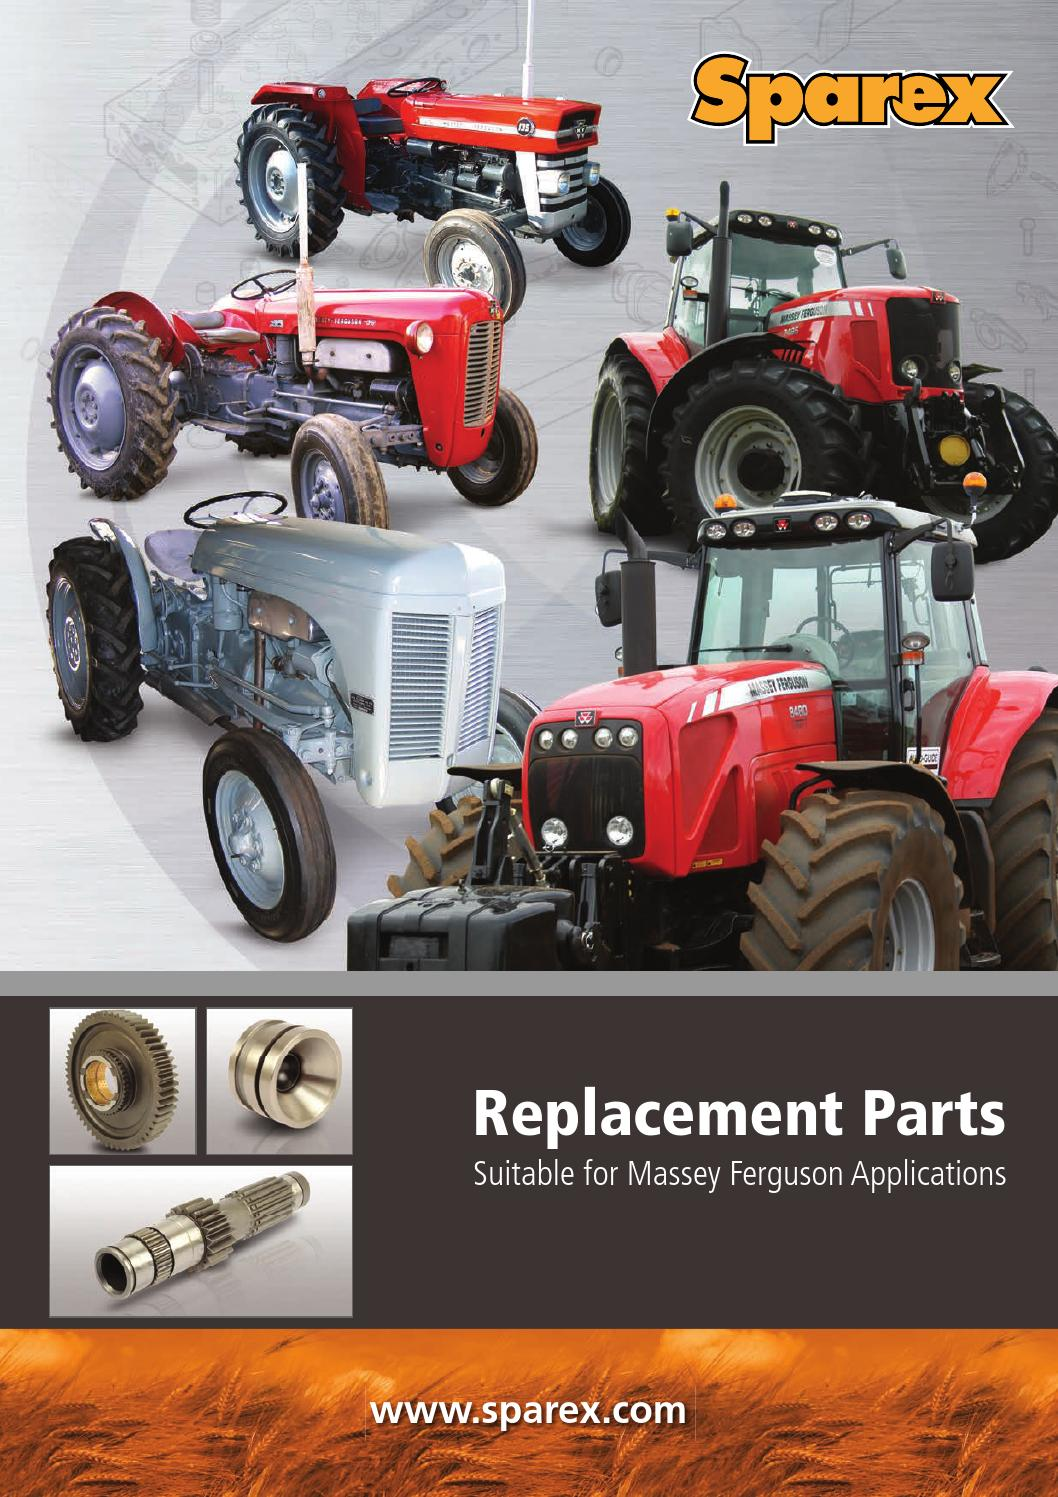 1851618M2 Steering Cylinder End Fits Massey Ferguson Tractor 135 148 230 240 250